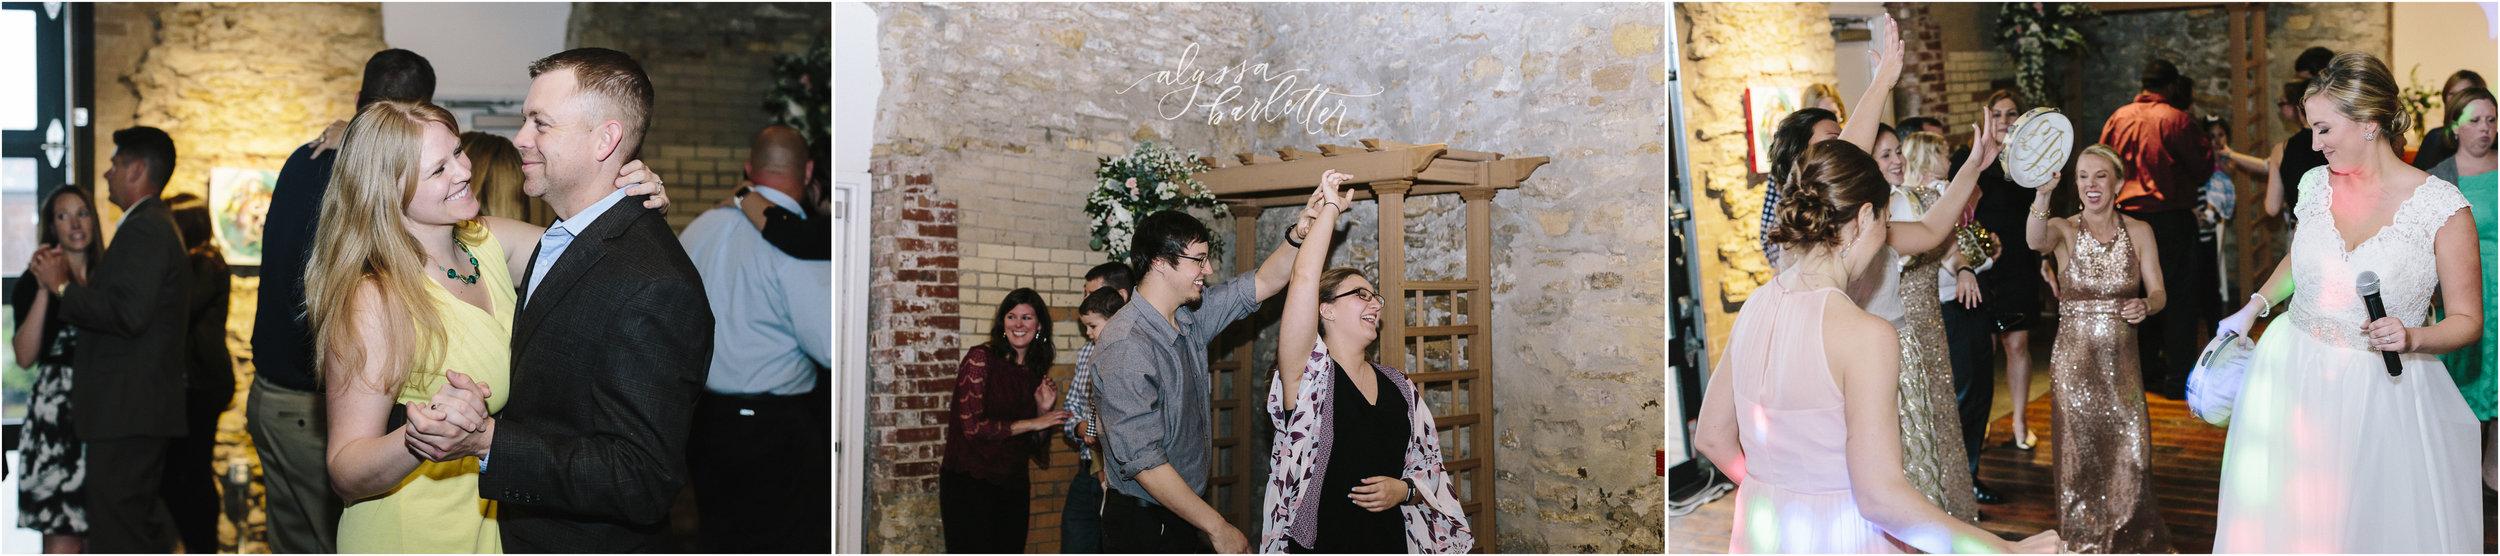 alyssa barletter photography cider gallery lawrence kansas rainy day wedding megan and brett-1-50.jpg